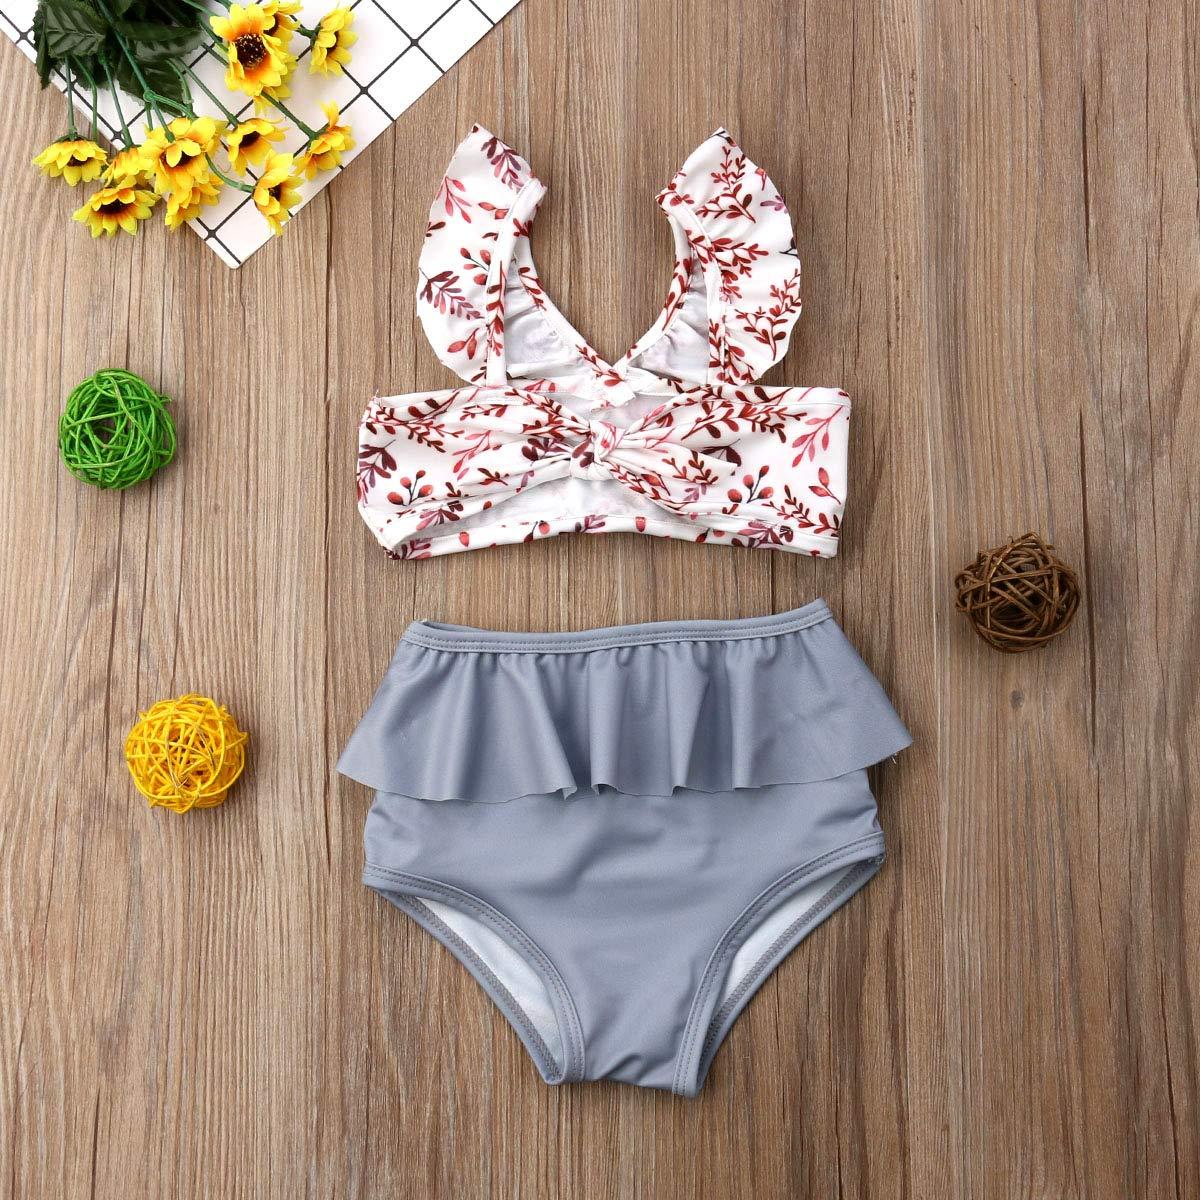 Toddler Baby Girl Swimsuit Stripe Sleeveless Halter Swimwear Bathing Suit Beachwear 2Pcs Summer Bikini Set